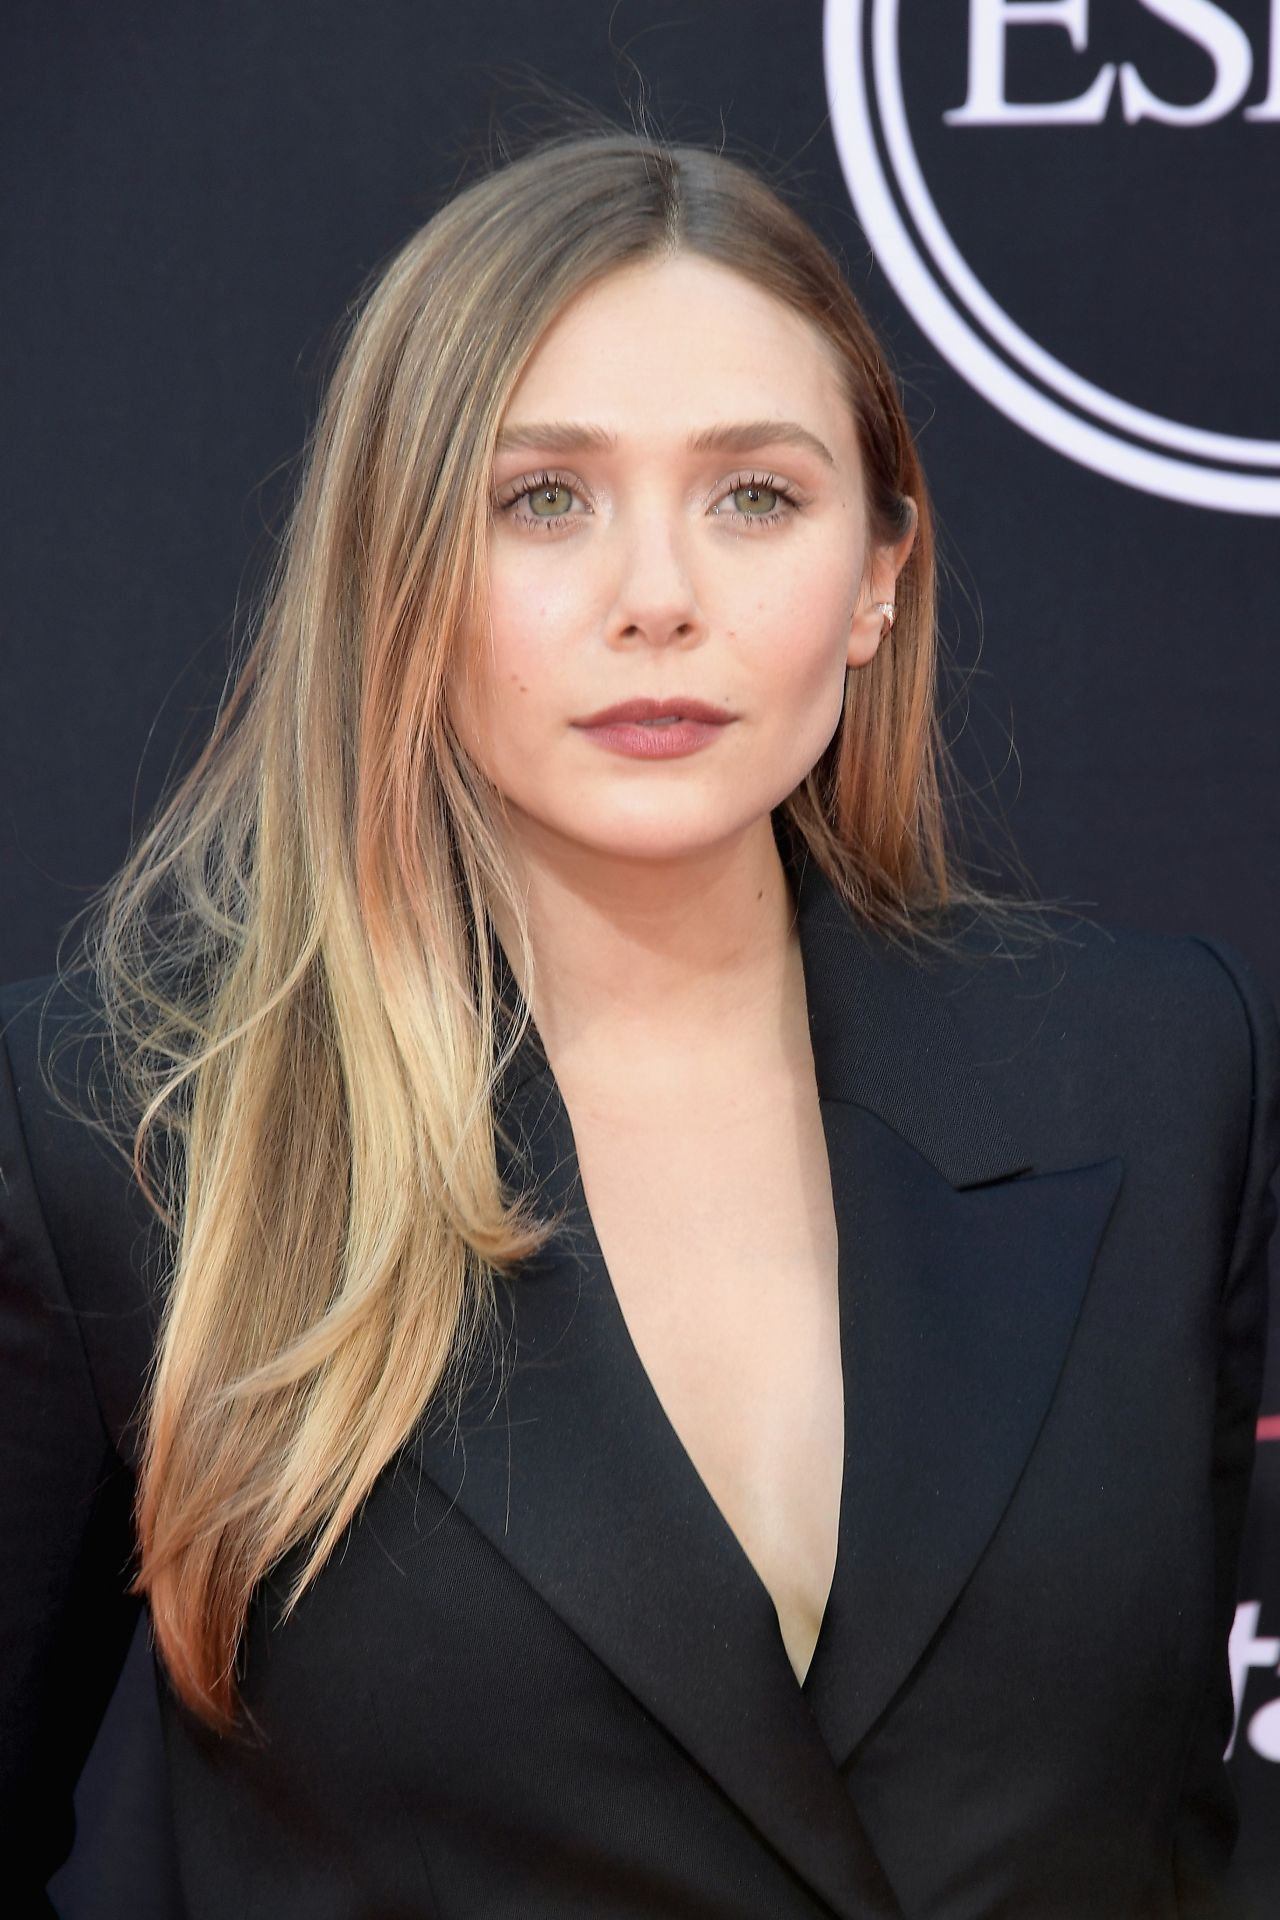 Elizabeth Olsen Espy Awards In Los Angeles 07 12 2017